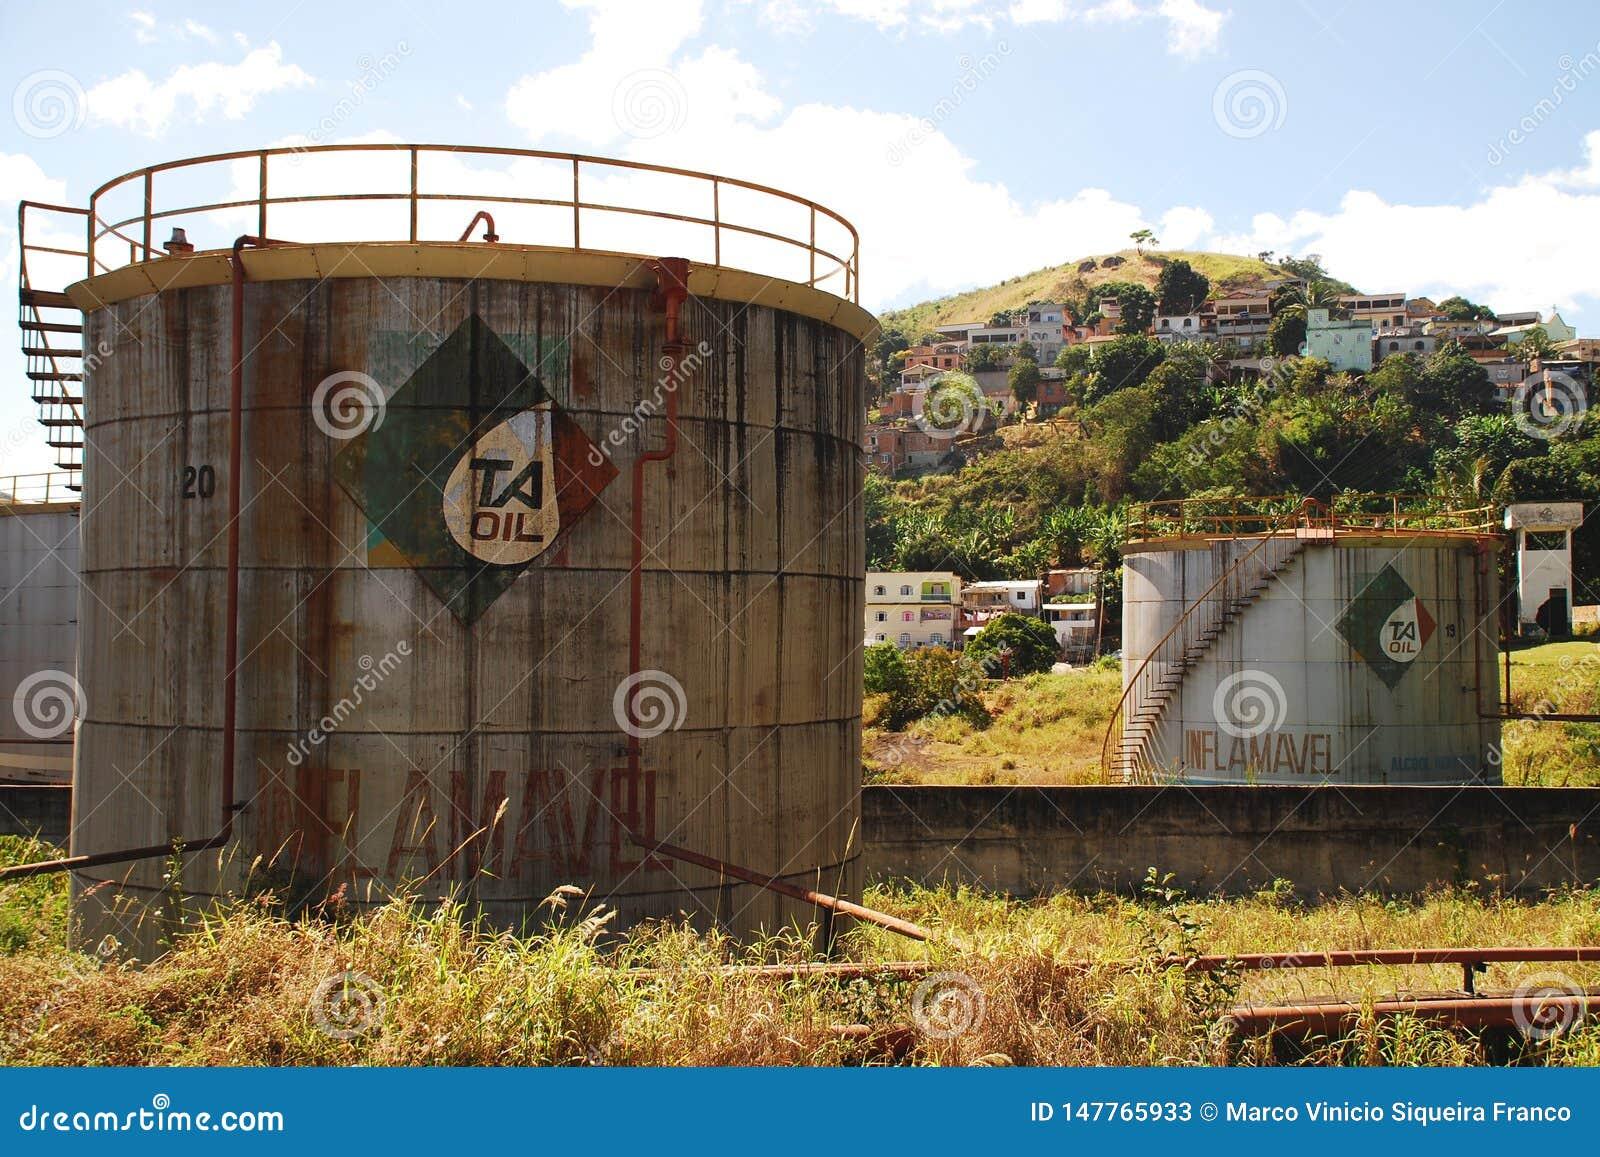 Zaniechani Nafciani zbiorniki w Vitoria, Brazil_04